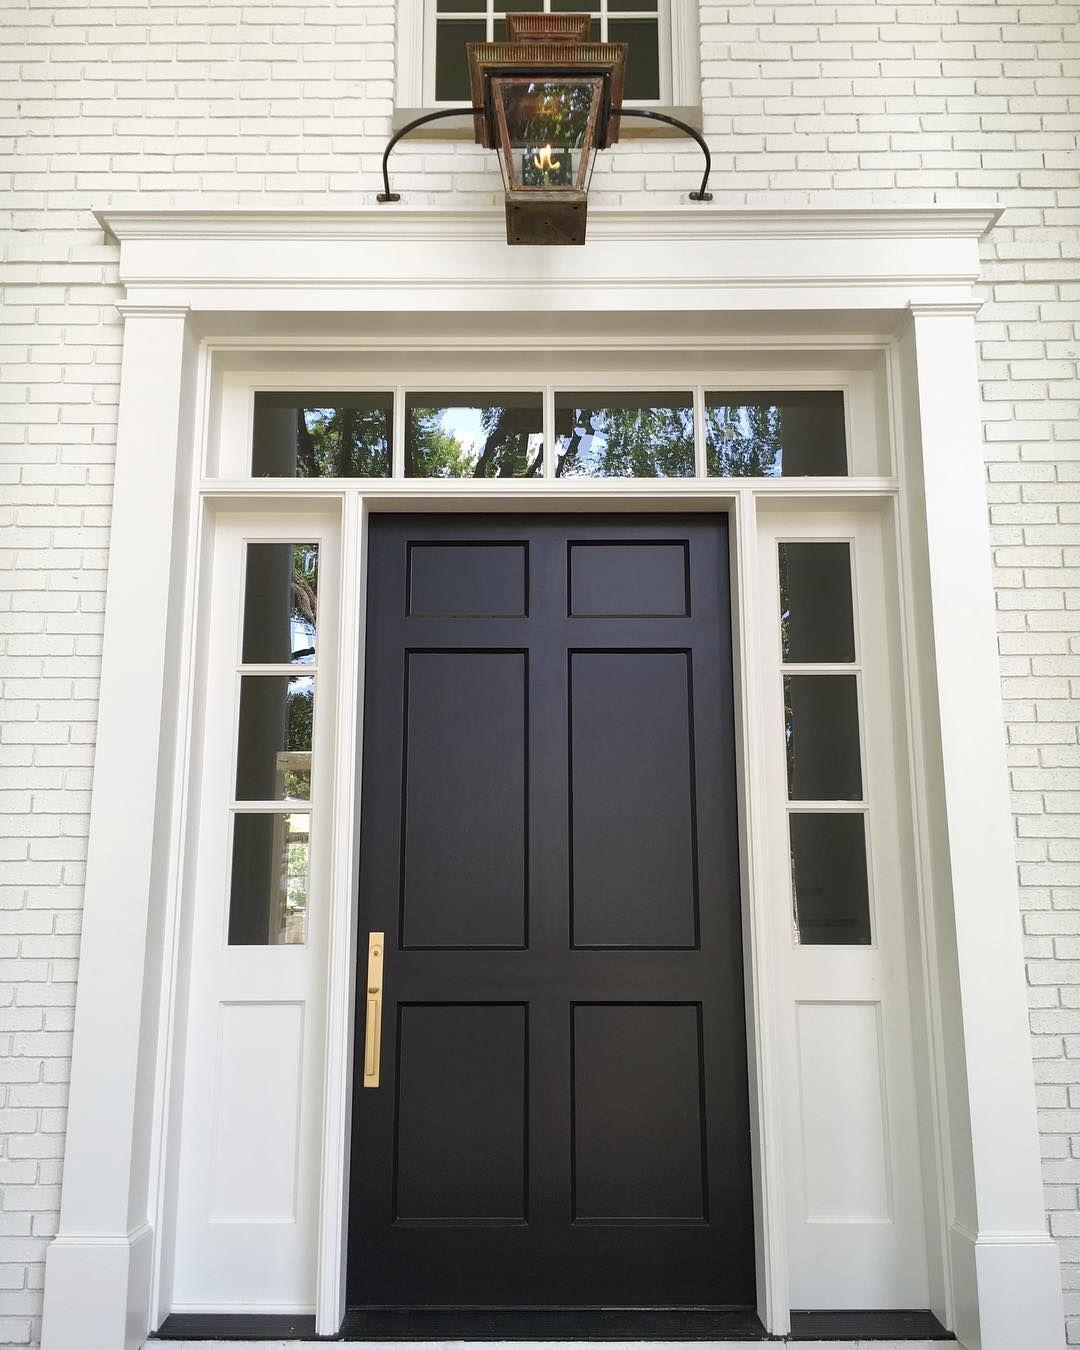 Exterior Design By Jenkins Interiors Black Front Door With Brass Hardware And Gas Lantern Windows Flank Black Exterior Doors Painted Brick House Front Door